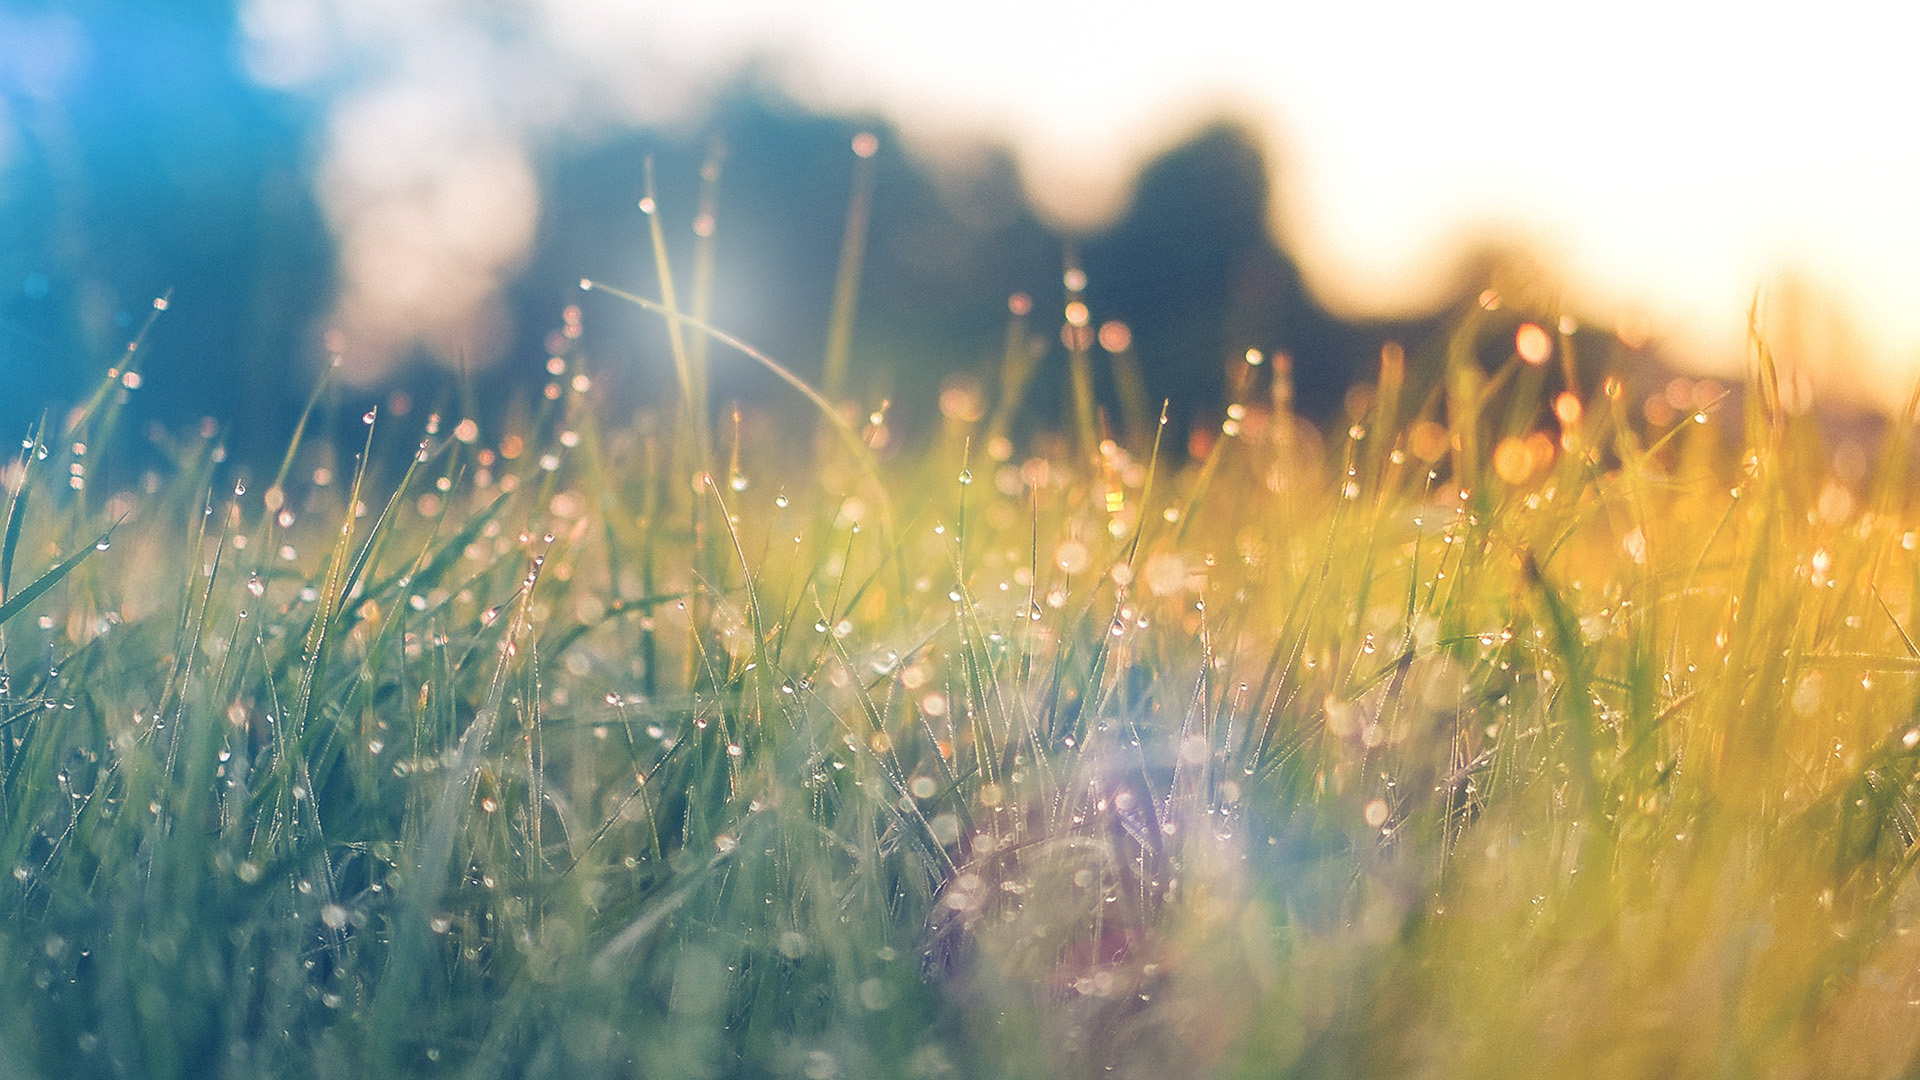 Fall Wallpaper Macbook Air Nm68 Lawn Green Nature Sunset Light Bokeh Spring Flare